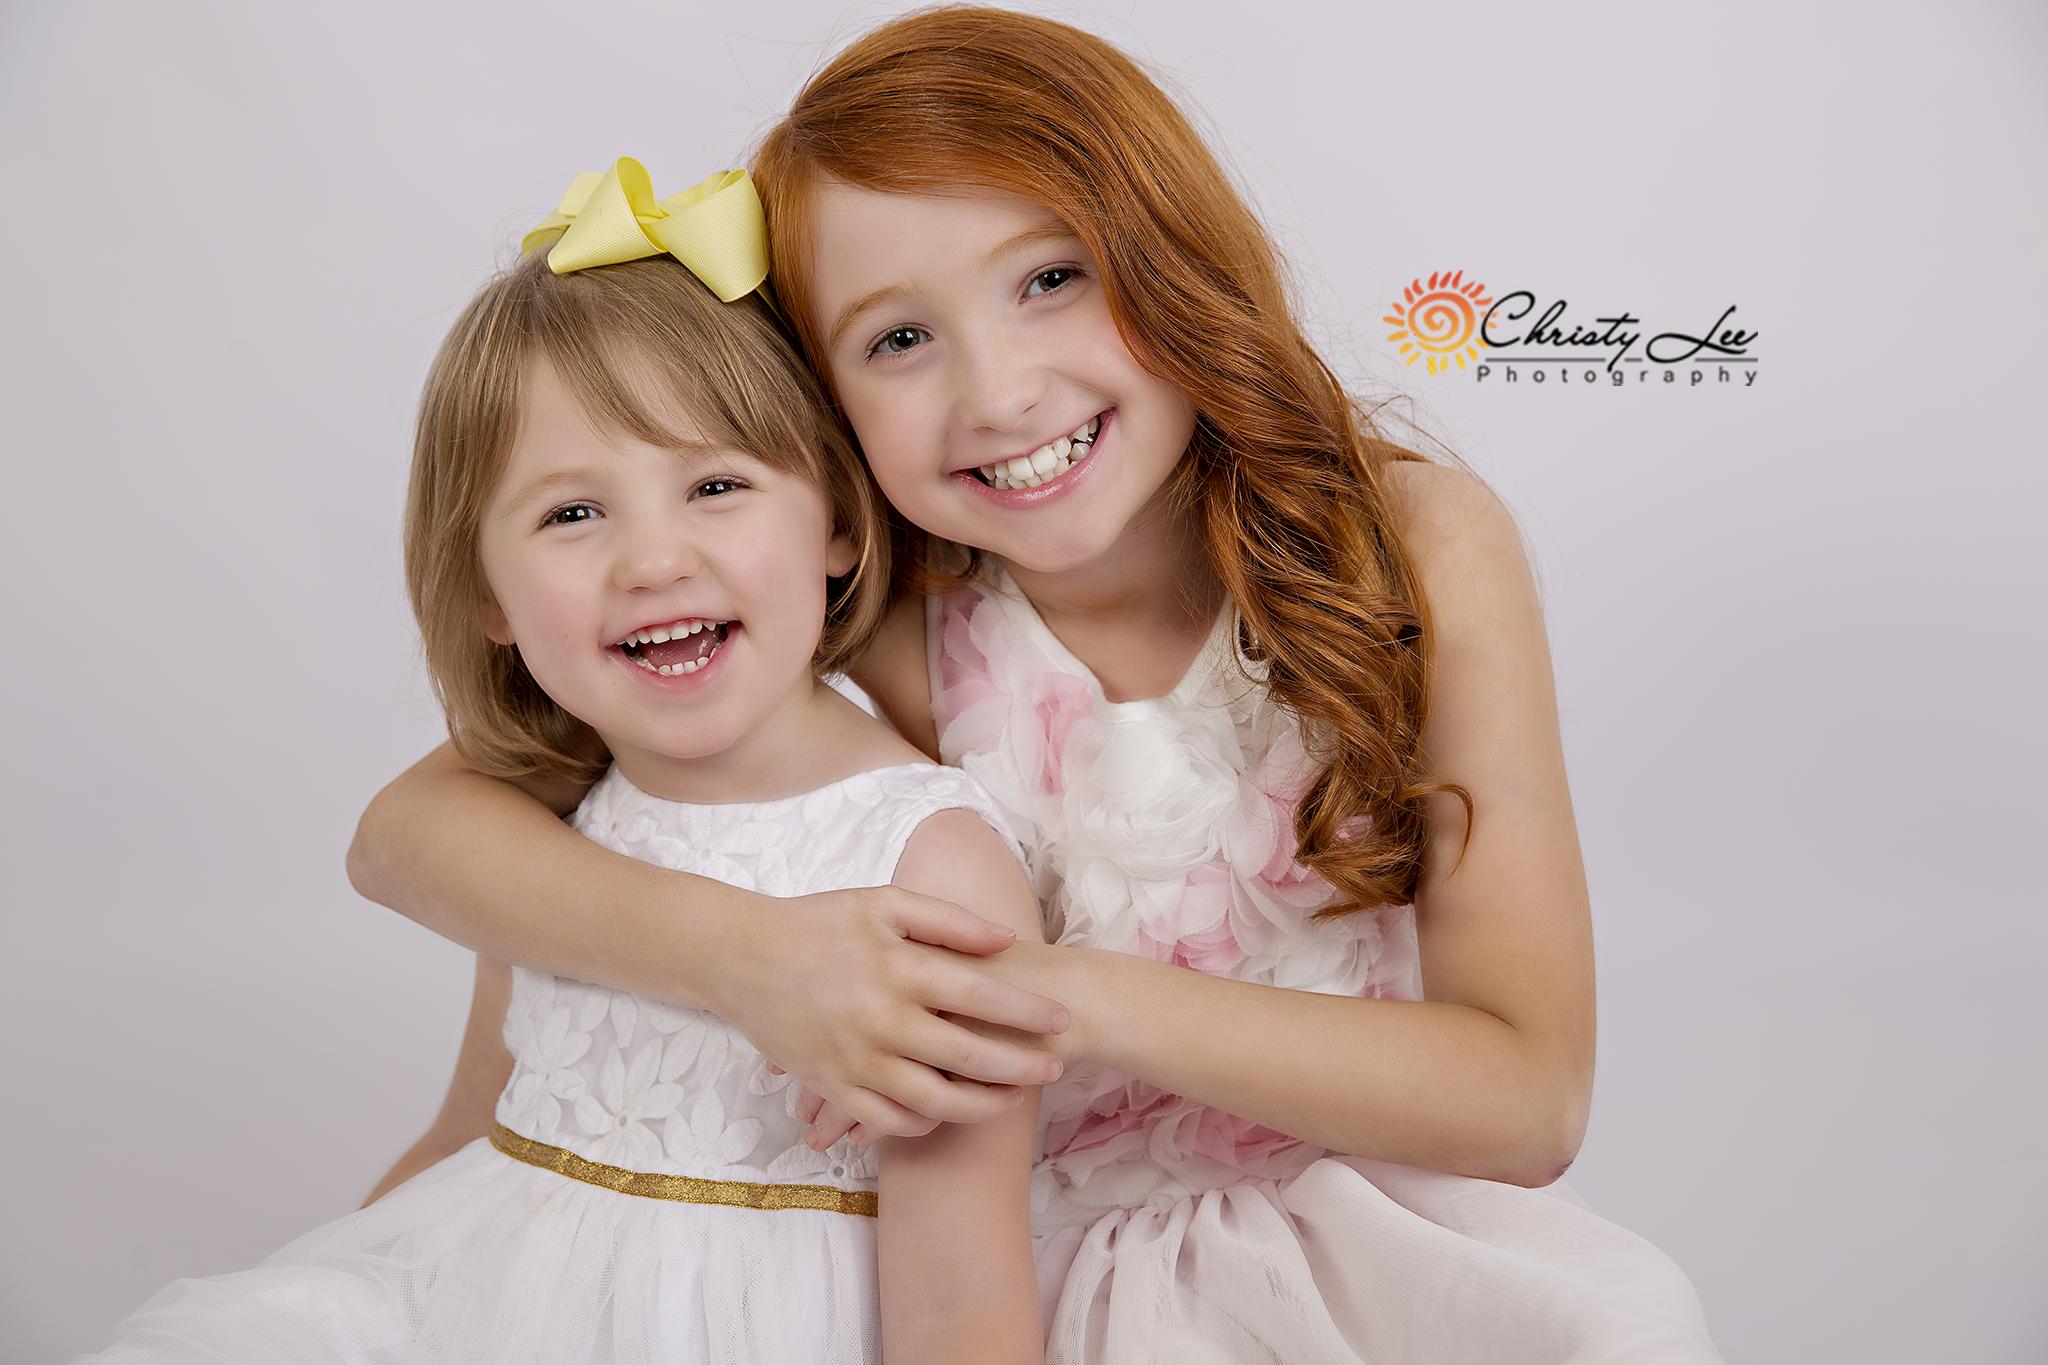 child-photography, alpharetta-photographer, atlanta-studio-photography, pageant-photography